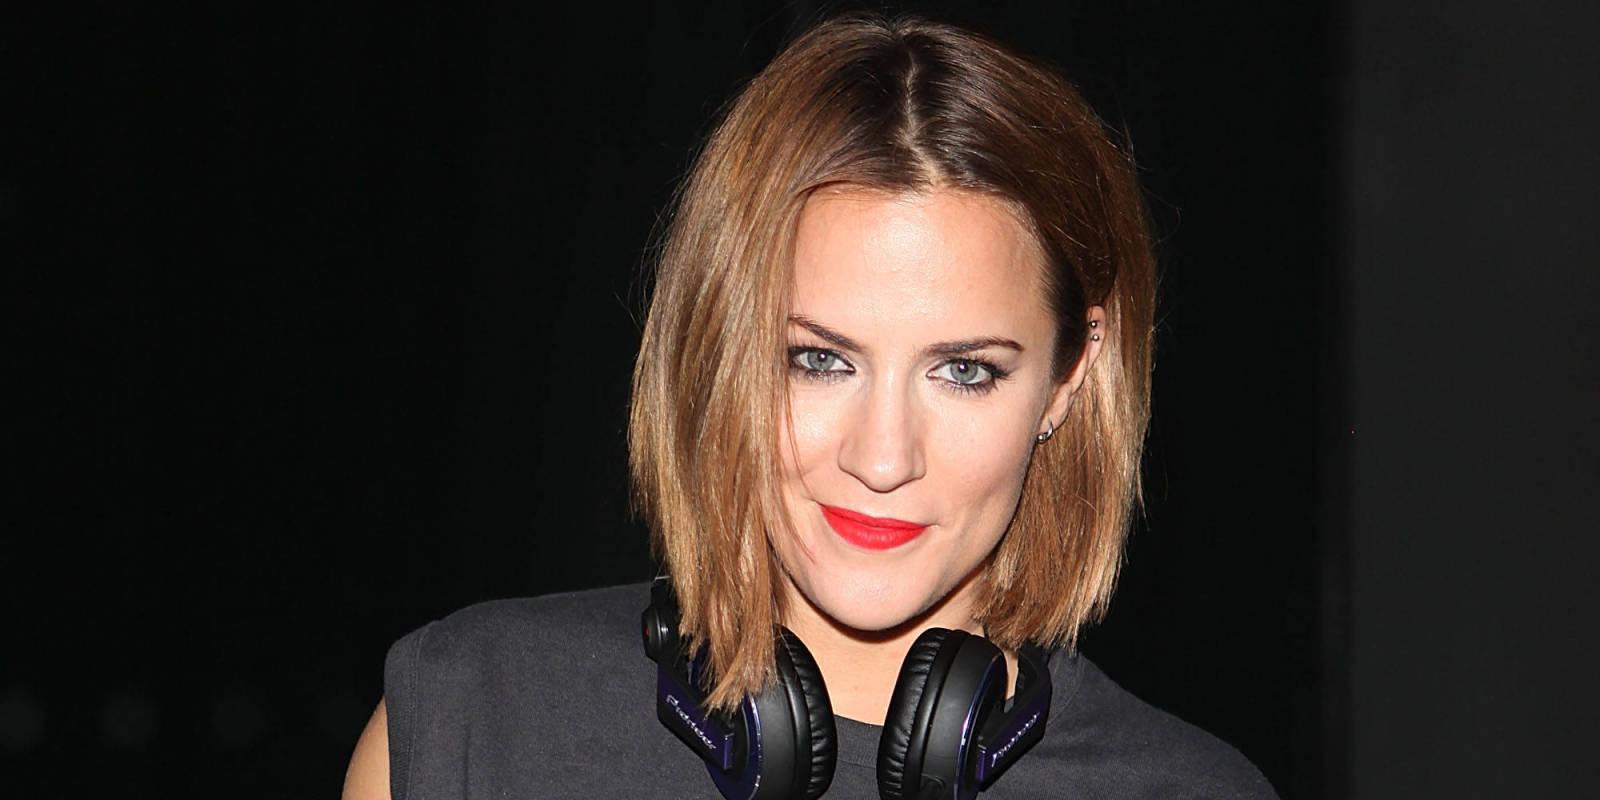 Caroline Flack Sexiest Presenters On Television Amp Radio